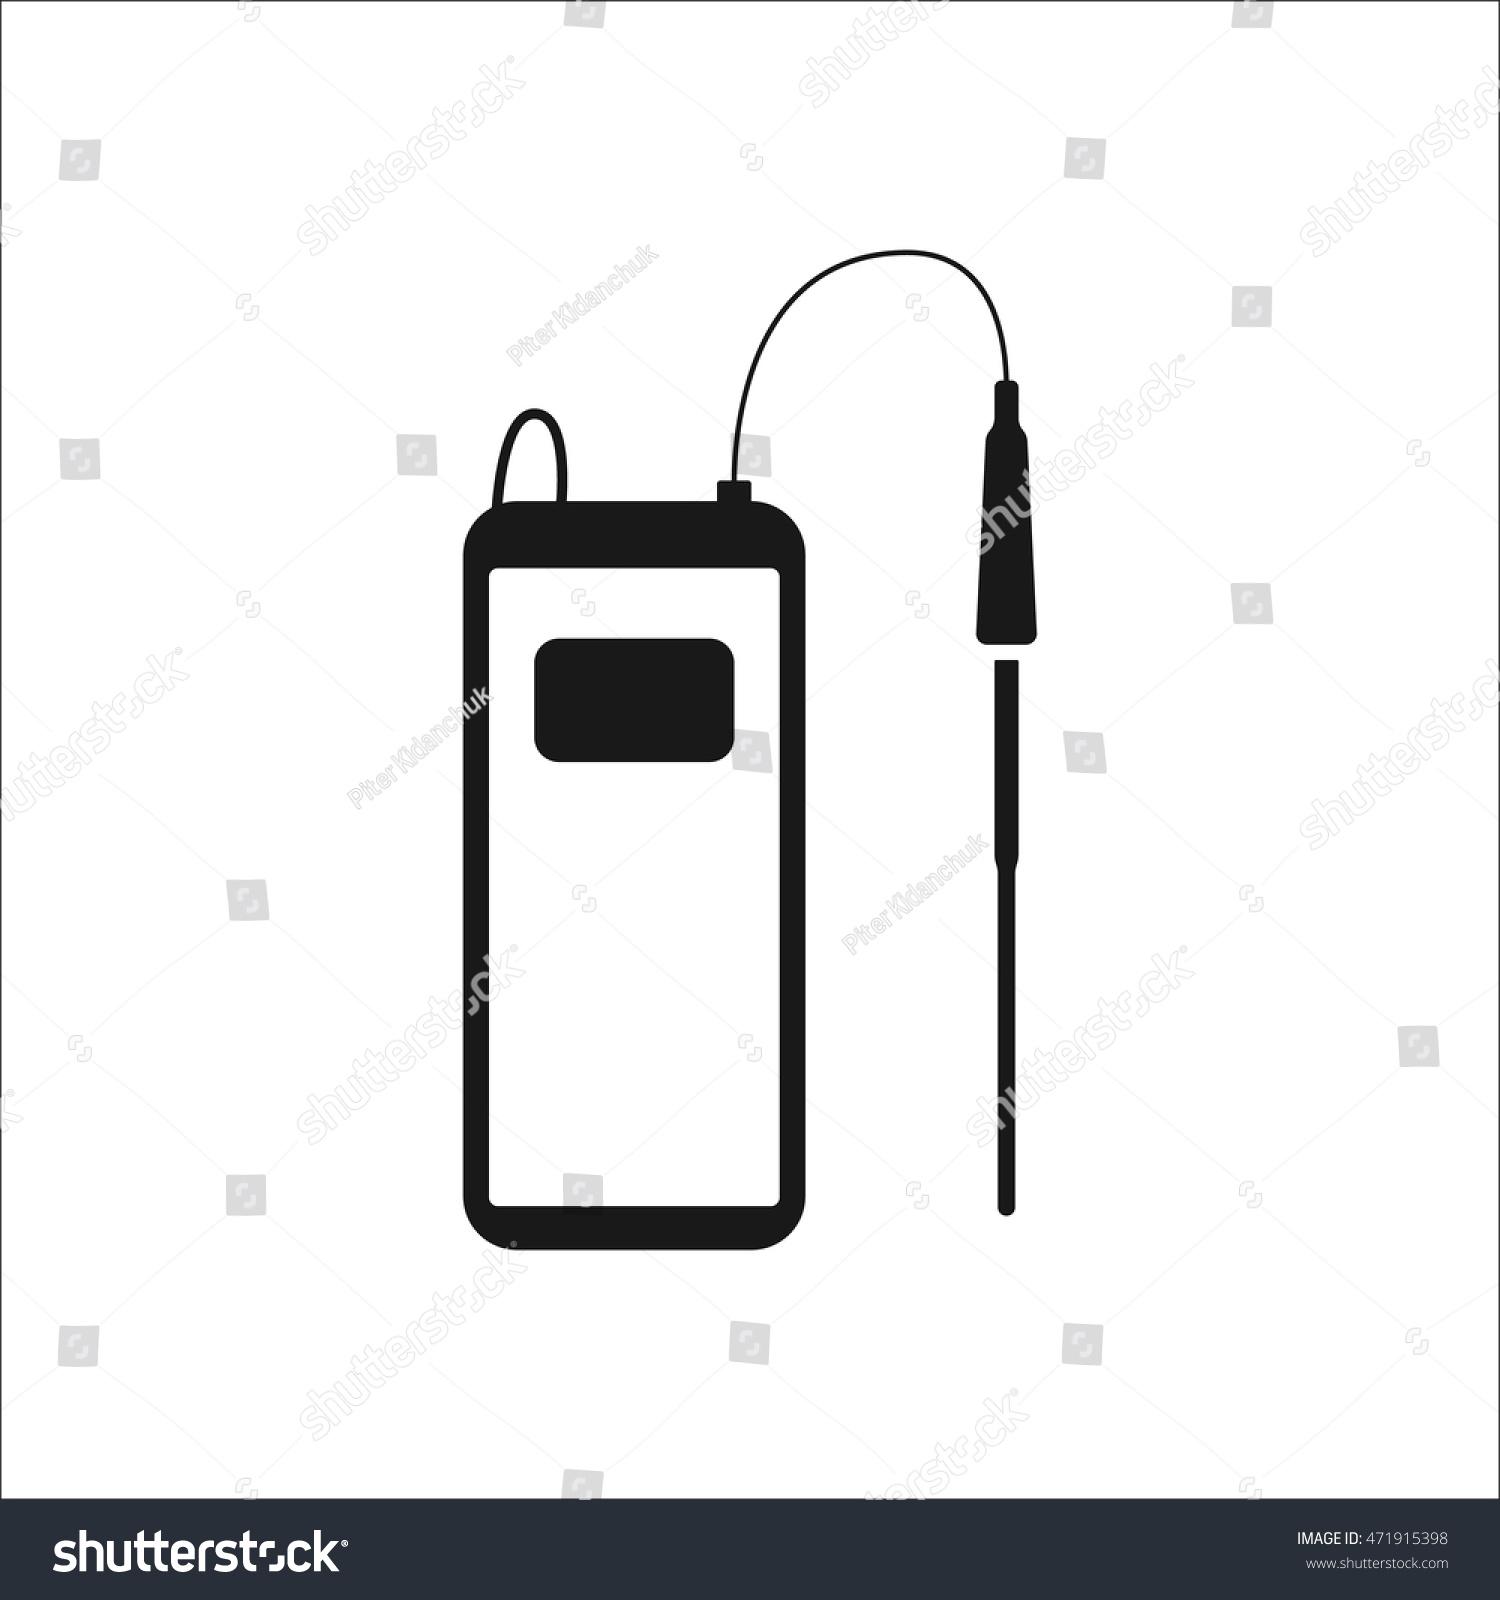 P H Meterchemistry Equipment Symbol Sign Simple Stock Vector ...